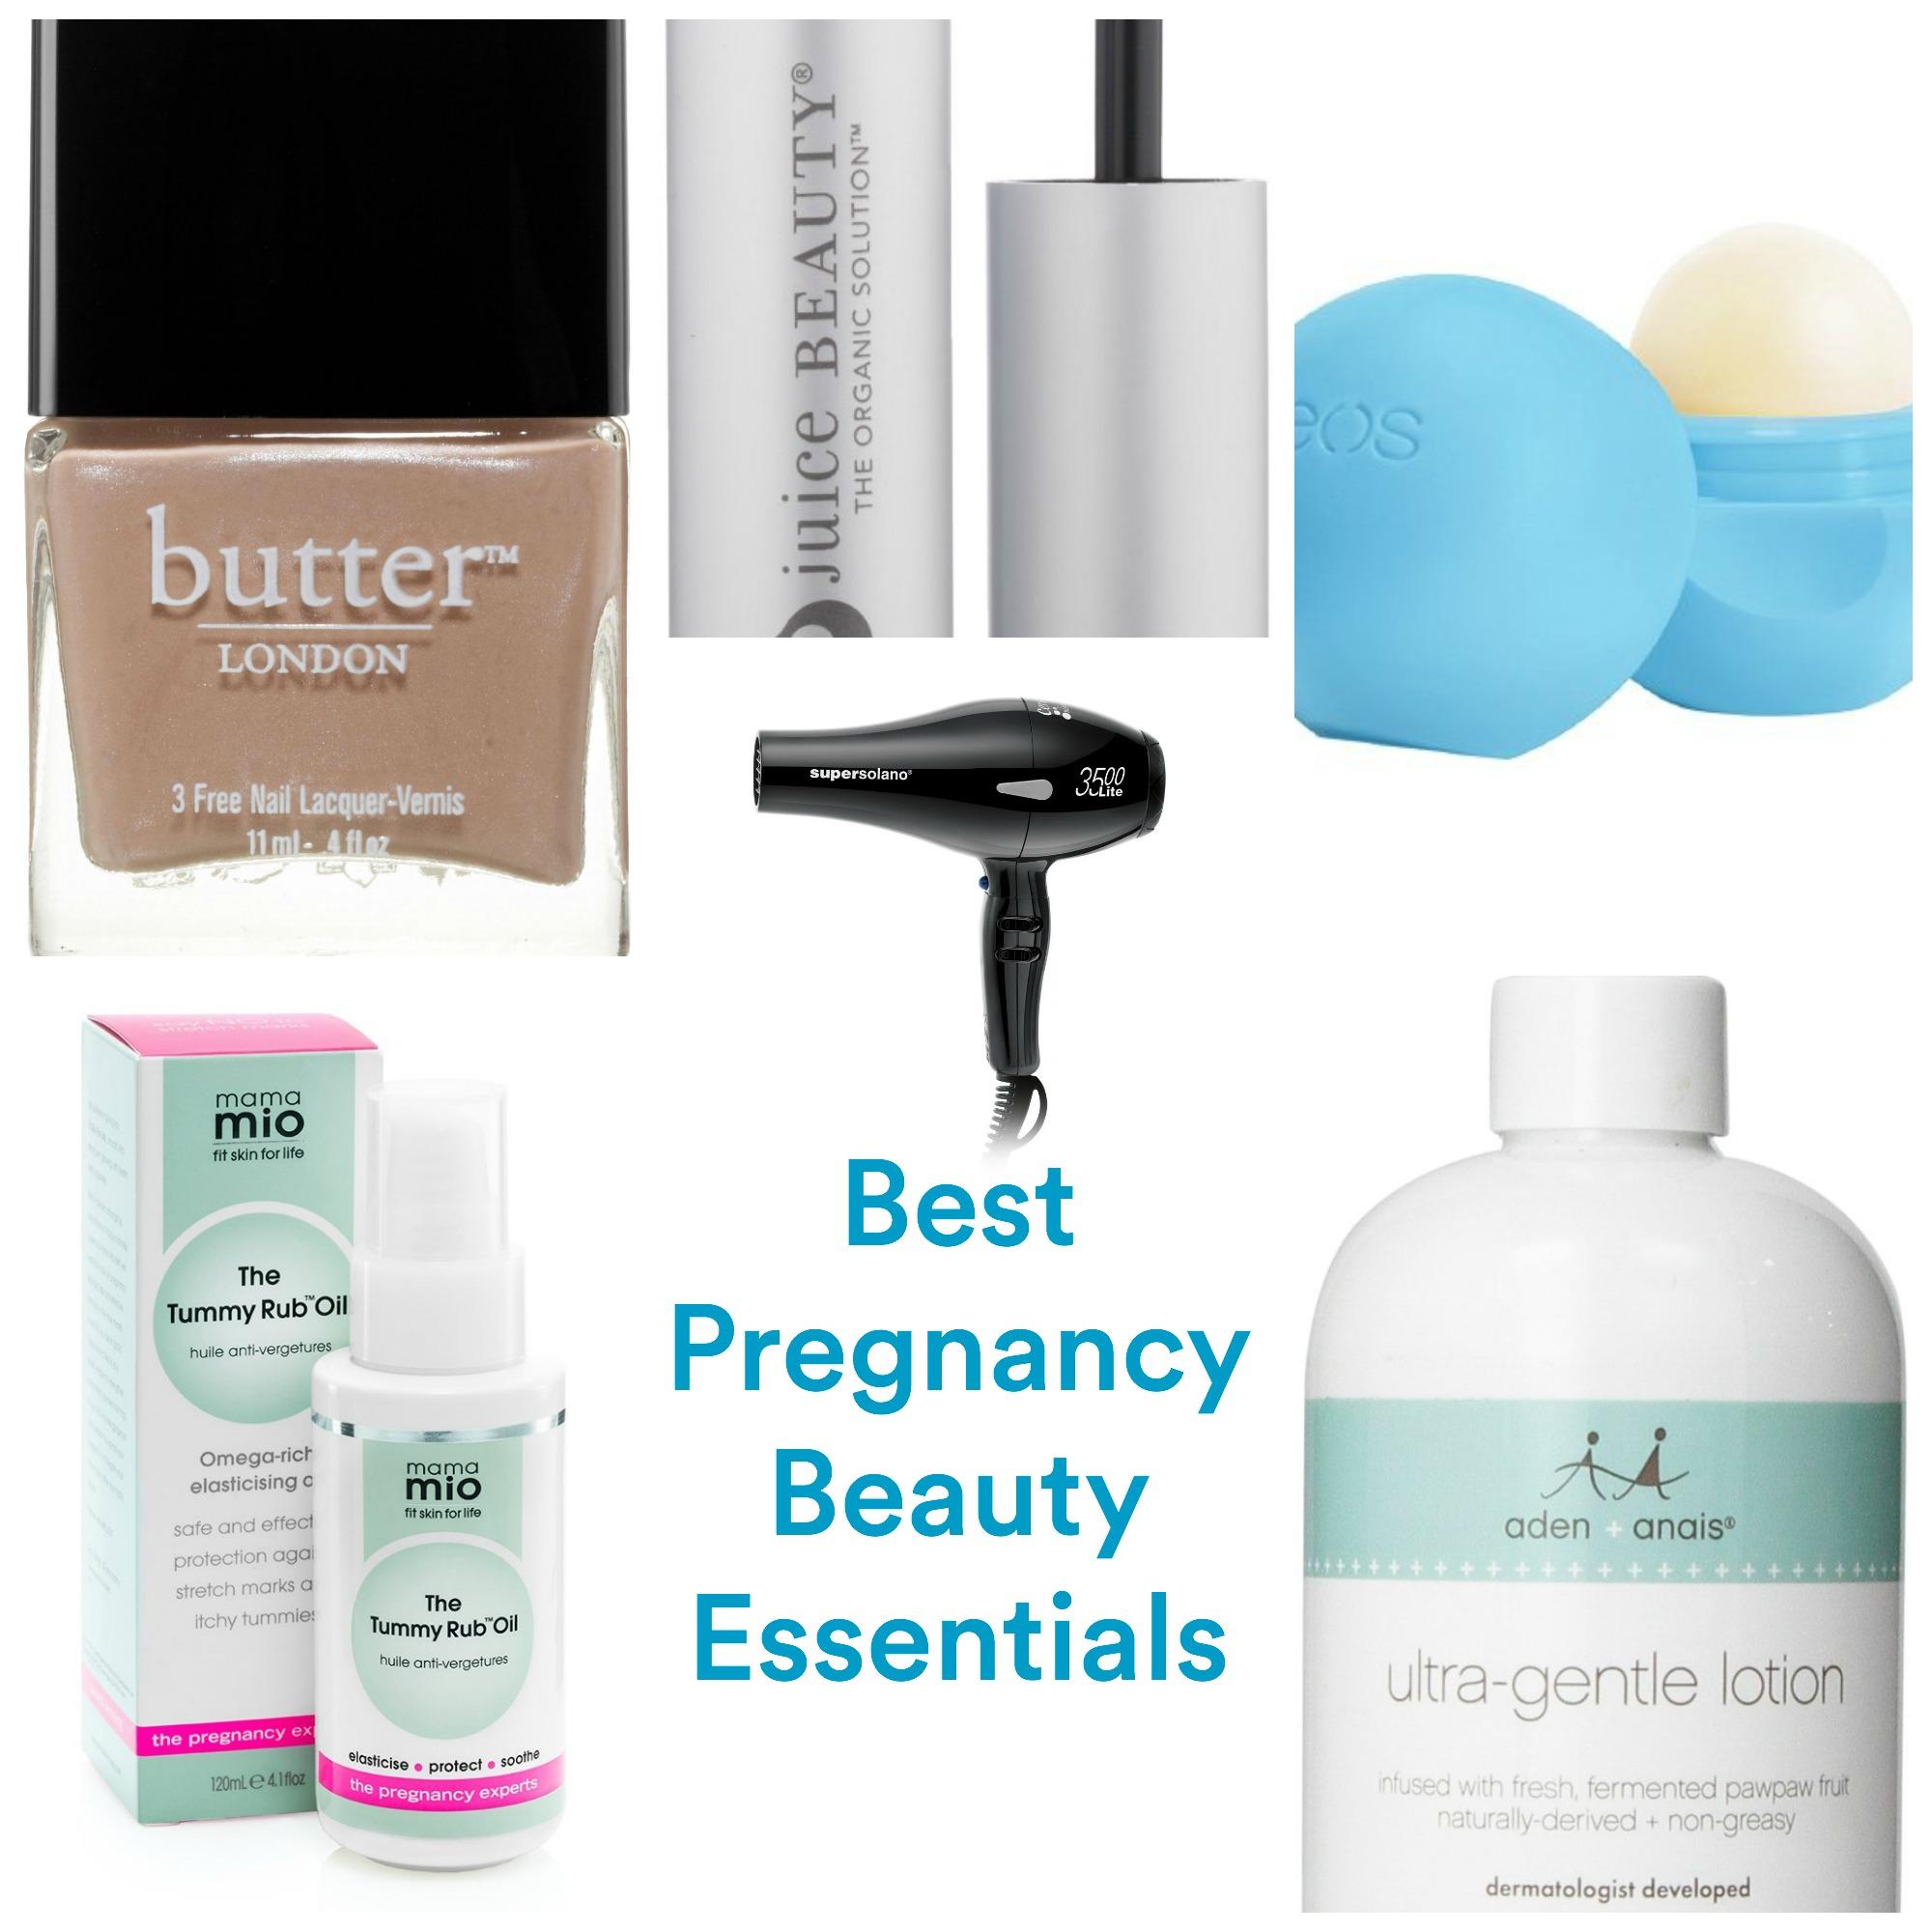 The 6 Best Pregnancy Beauty Essentials - Gugu Guru Blog